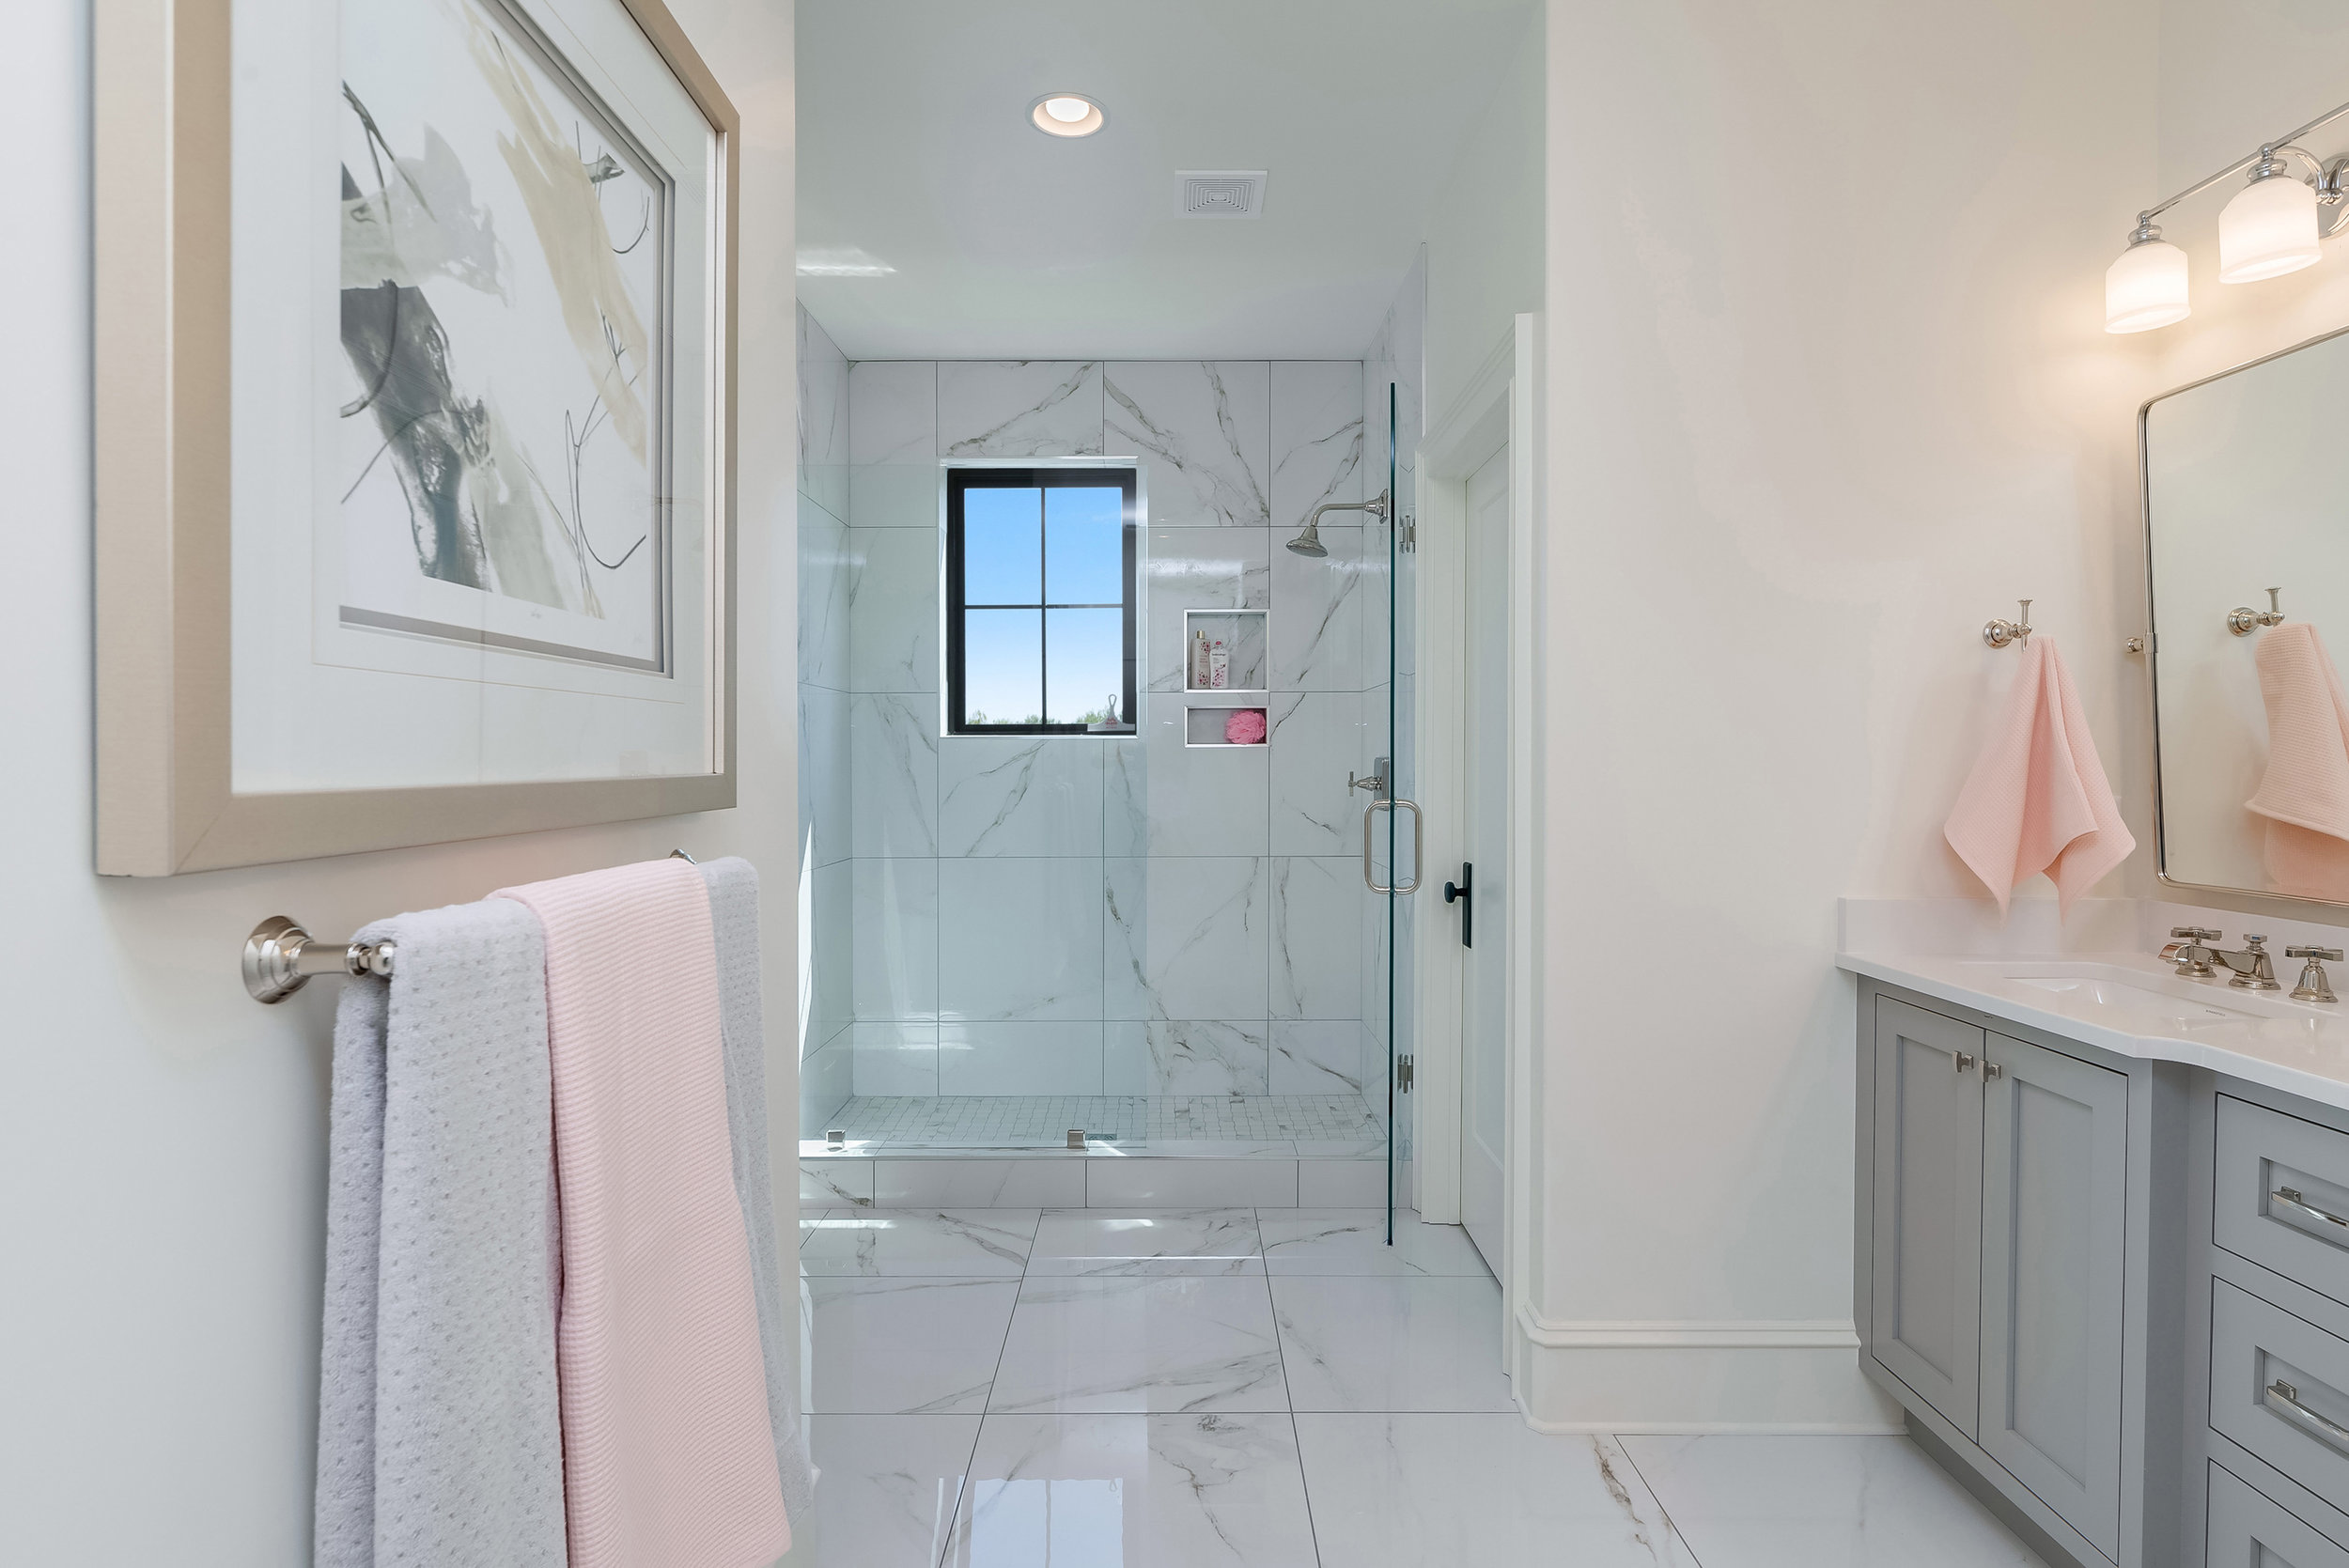 19-Bathroom.jpg